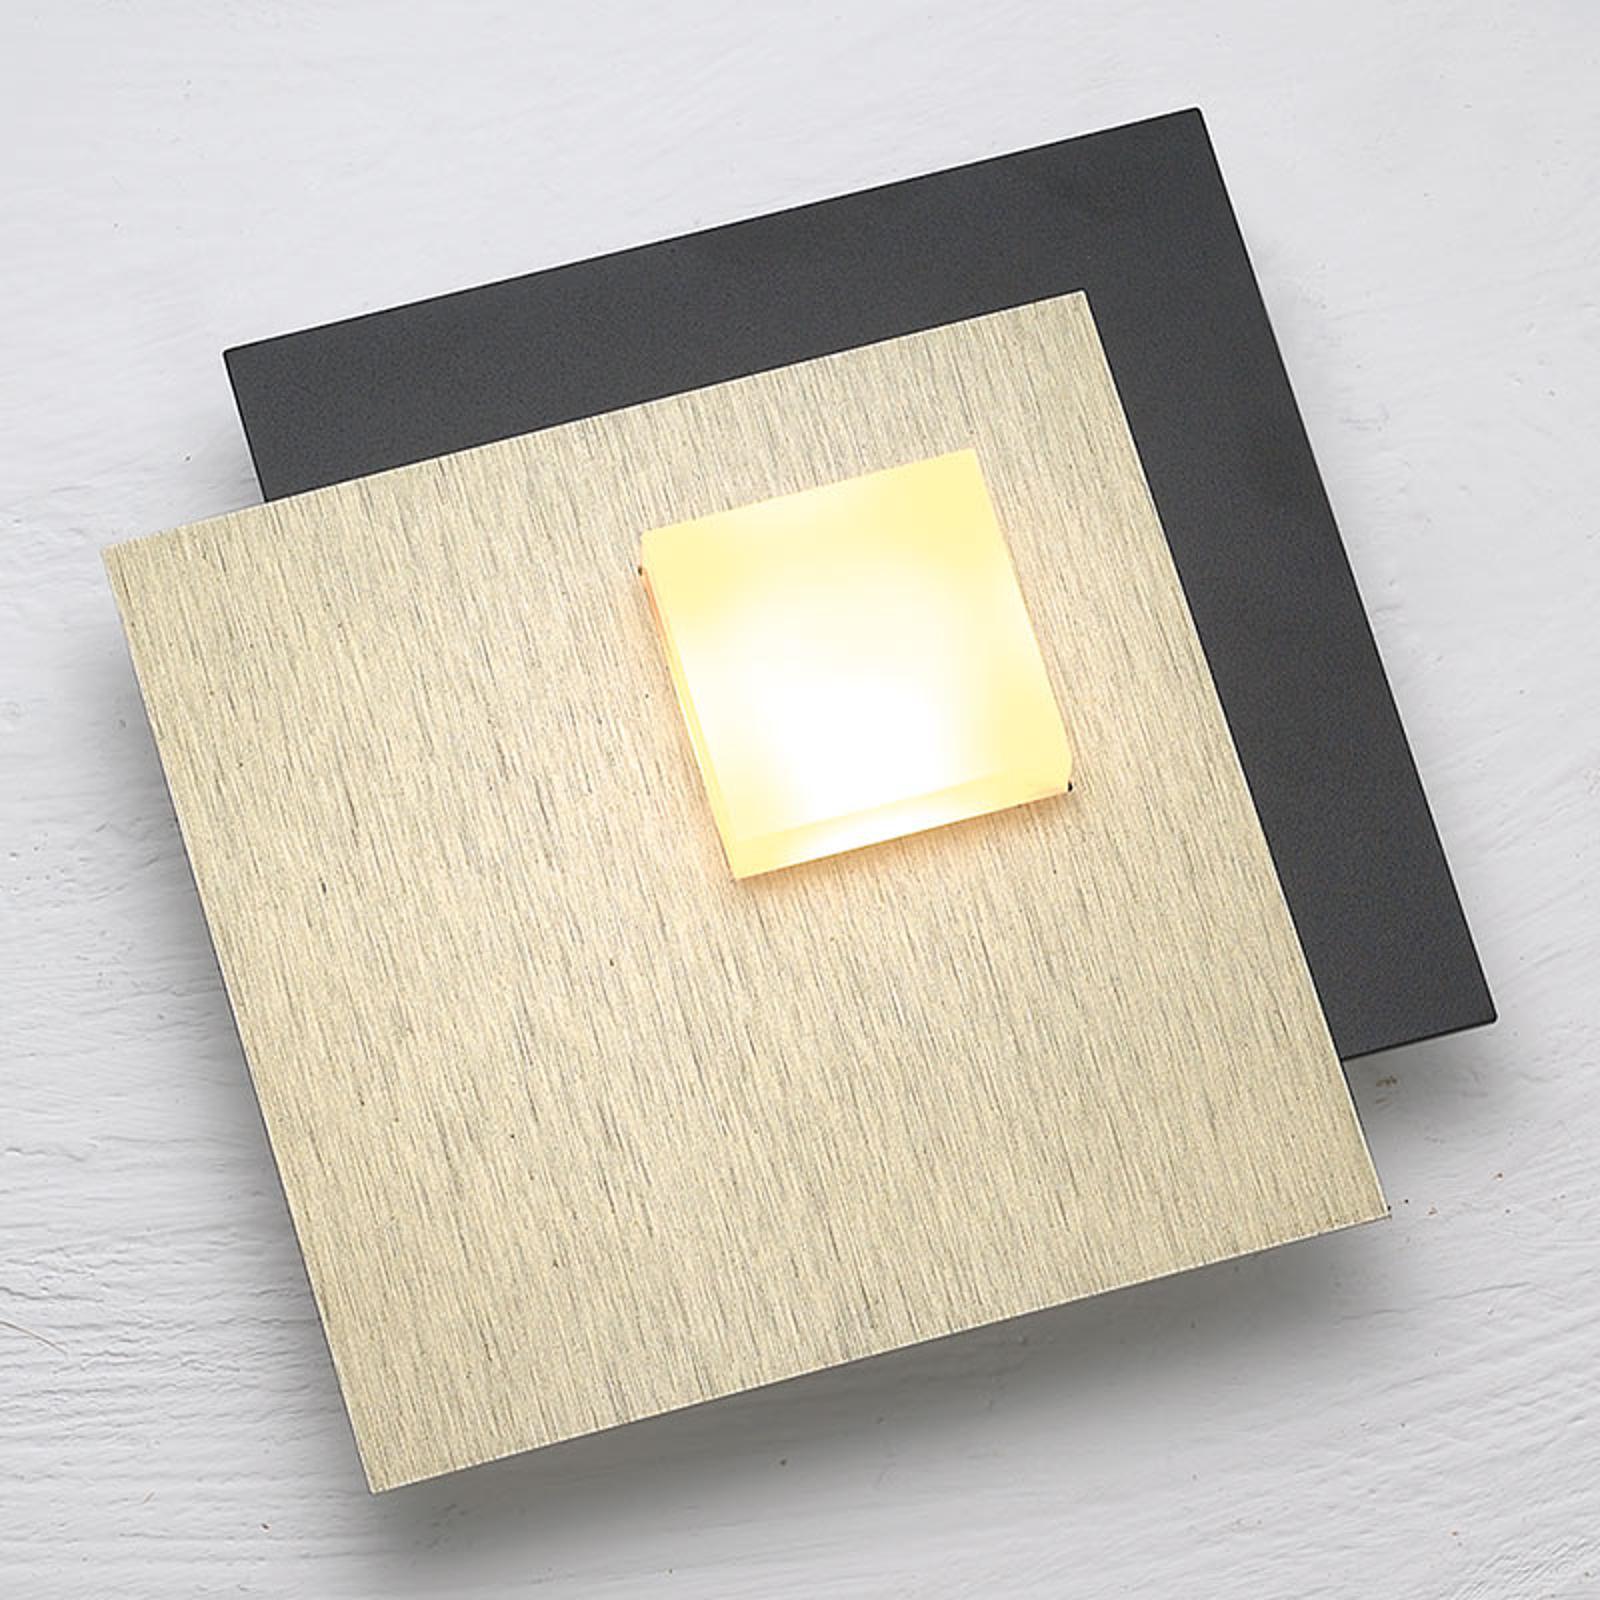 Bopp Pixel 2.0 lampa sufitowa LED 1-pkt. czarna